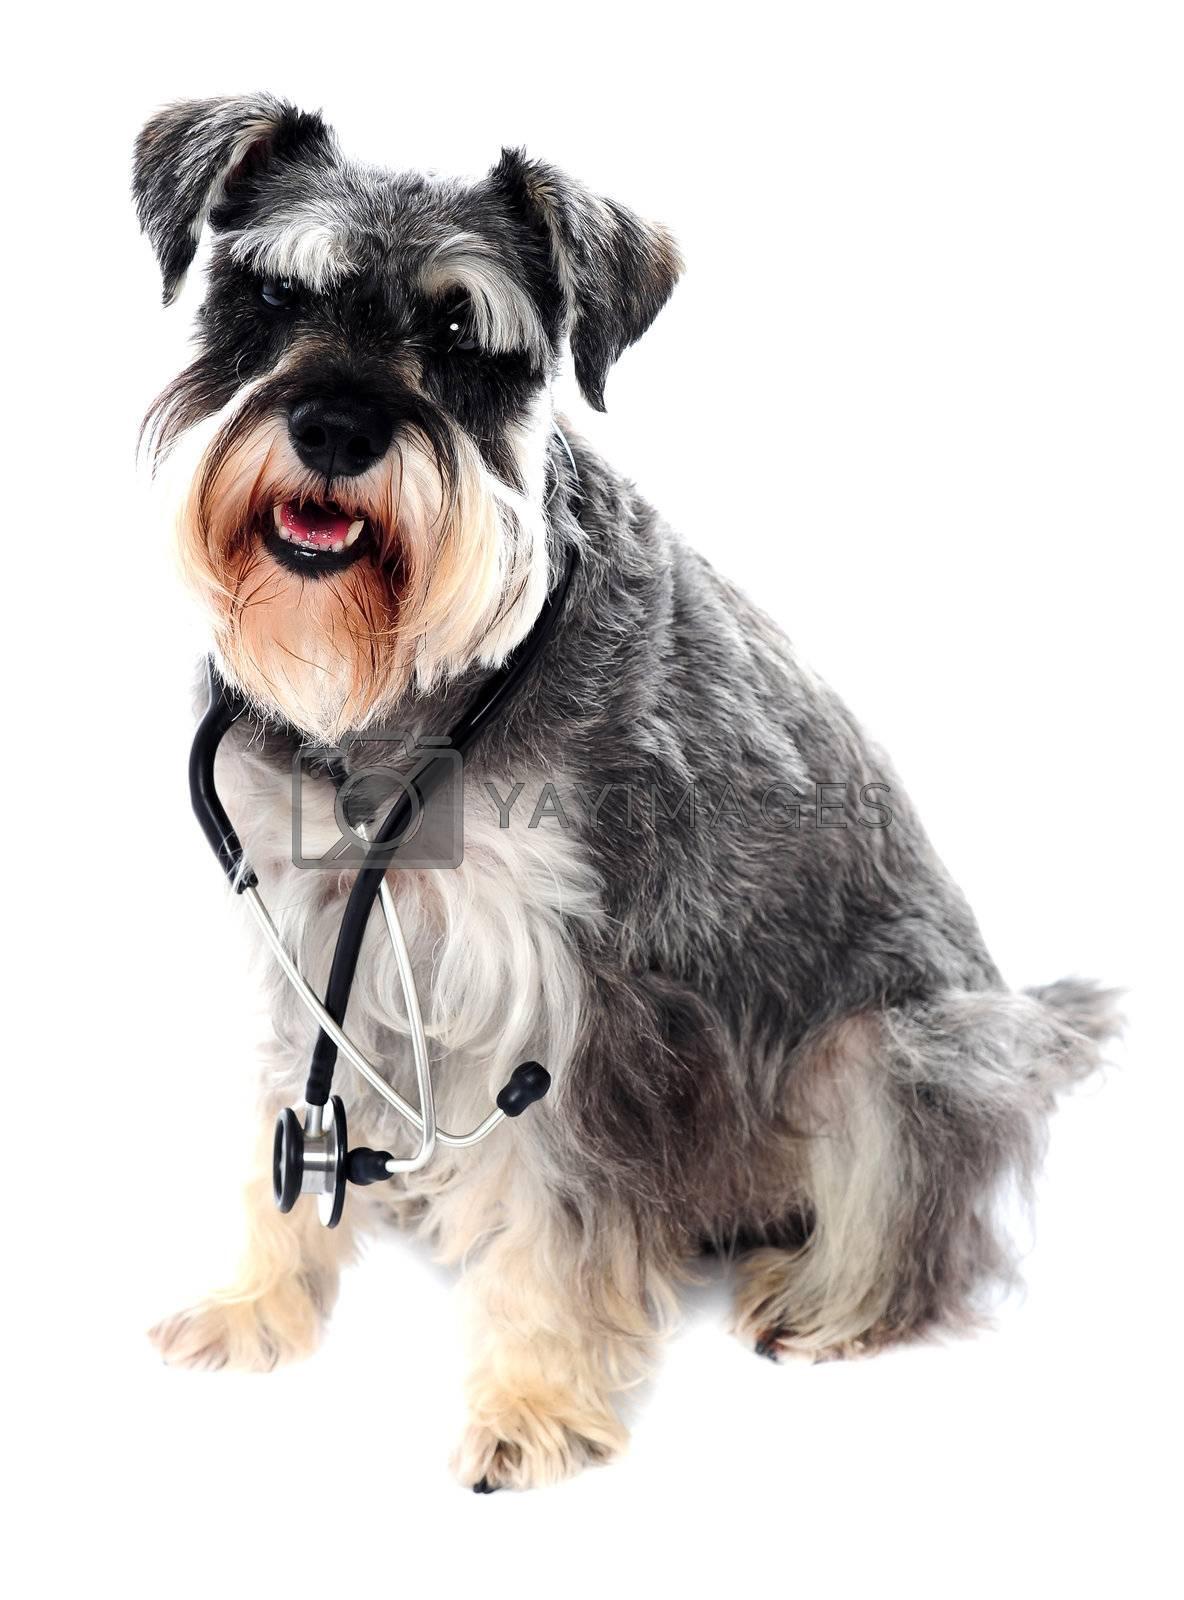 Schnauzer dog posing with stethoscope around its neck. All on white background